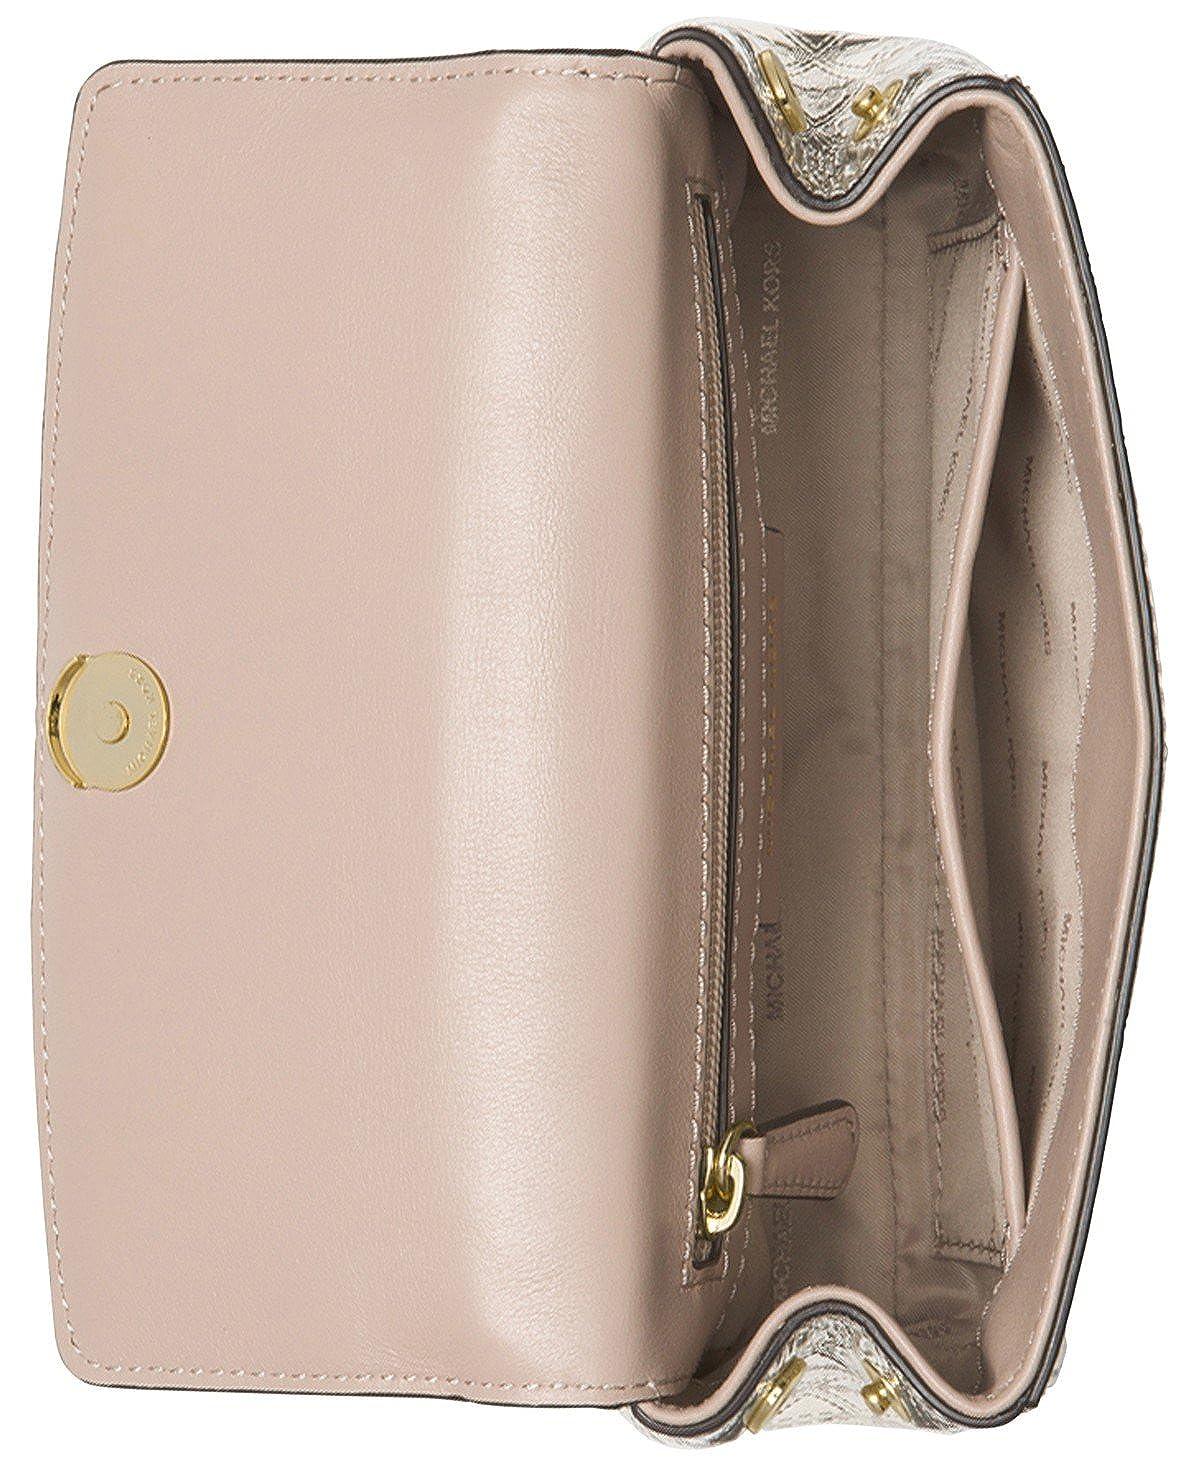 1258faa2bc5e MICHAEL Michael Kors Ava Mini Specchio Leather Crossbody Bag, Champagne:  Handbags: Amazon.com